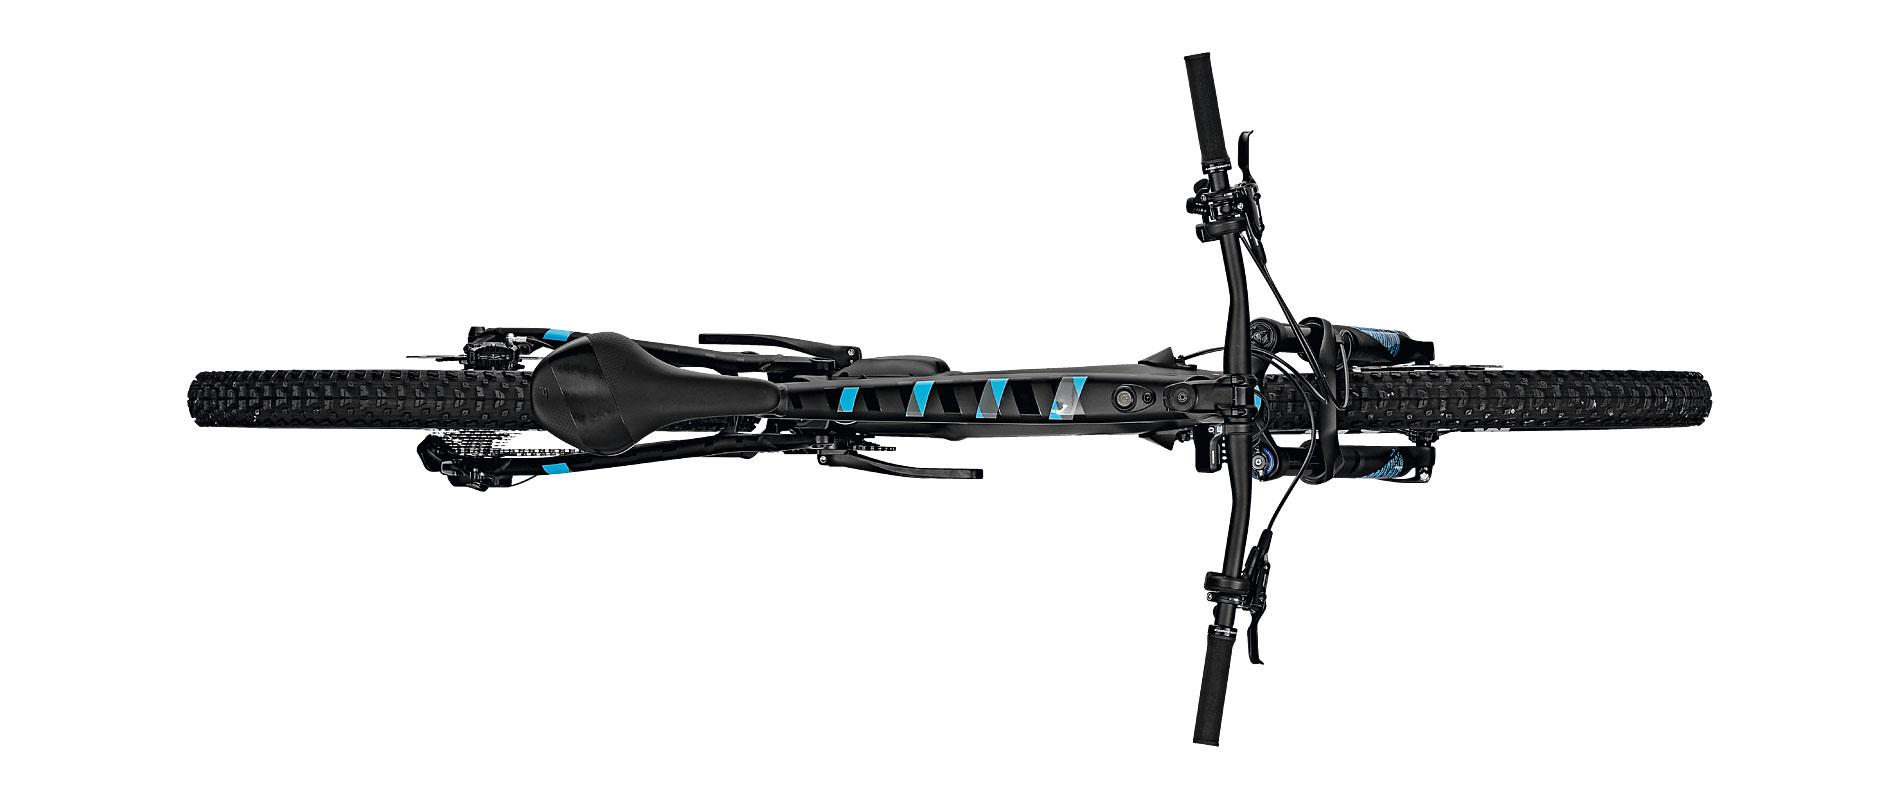 https://bikepointtenerife.com/wp-content/uploads/2019/05/jam2-plus-pro1.jpg